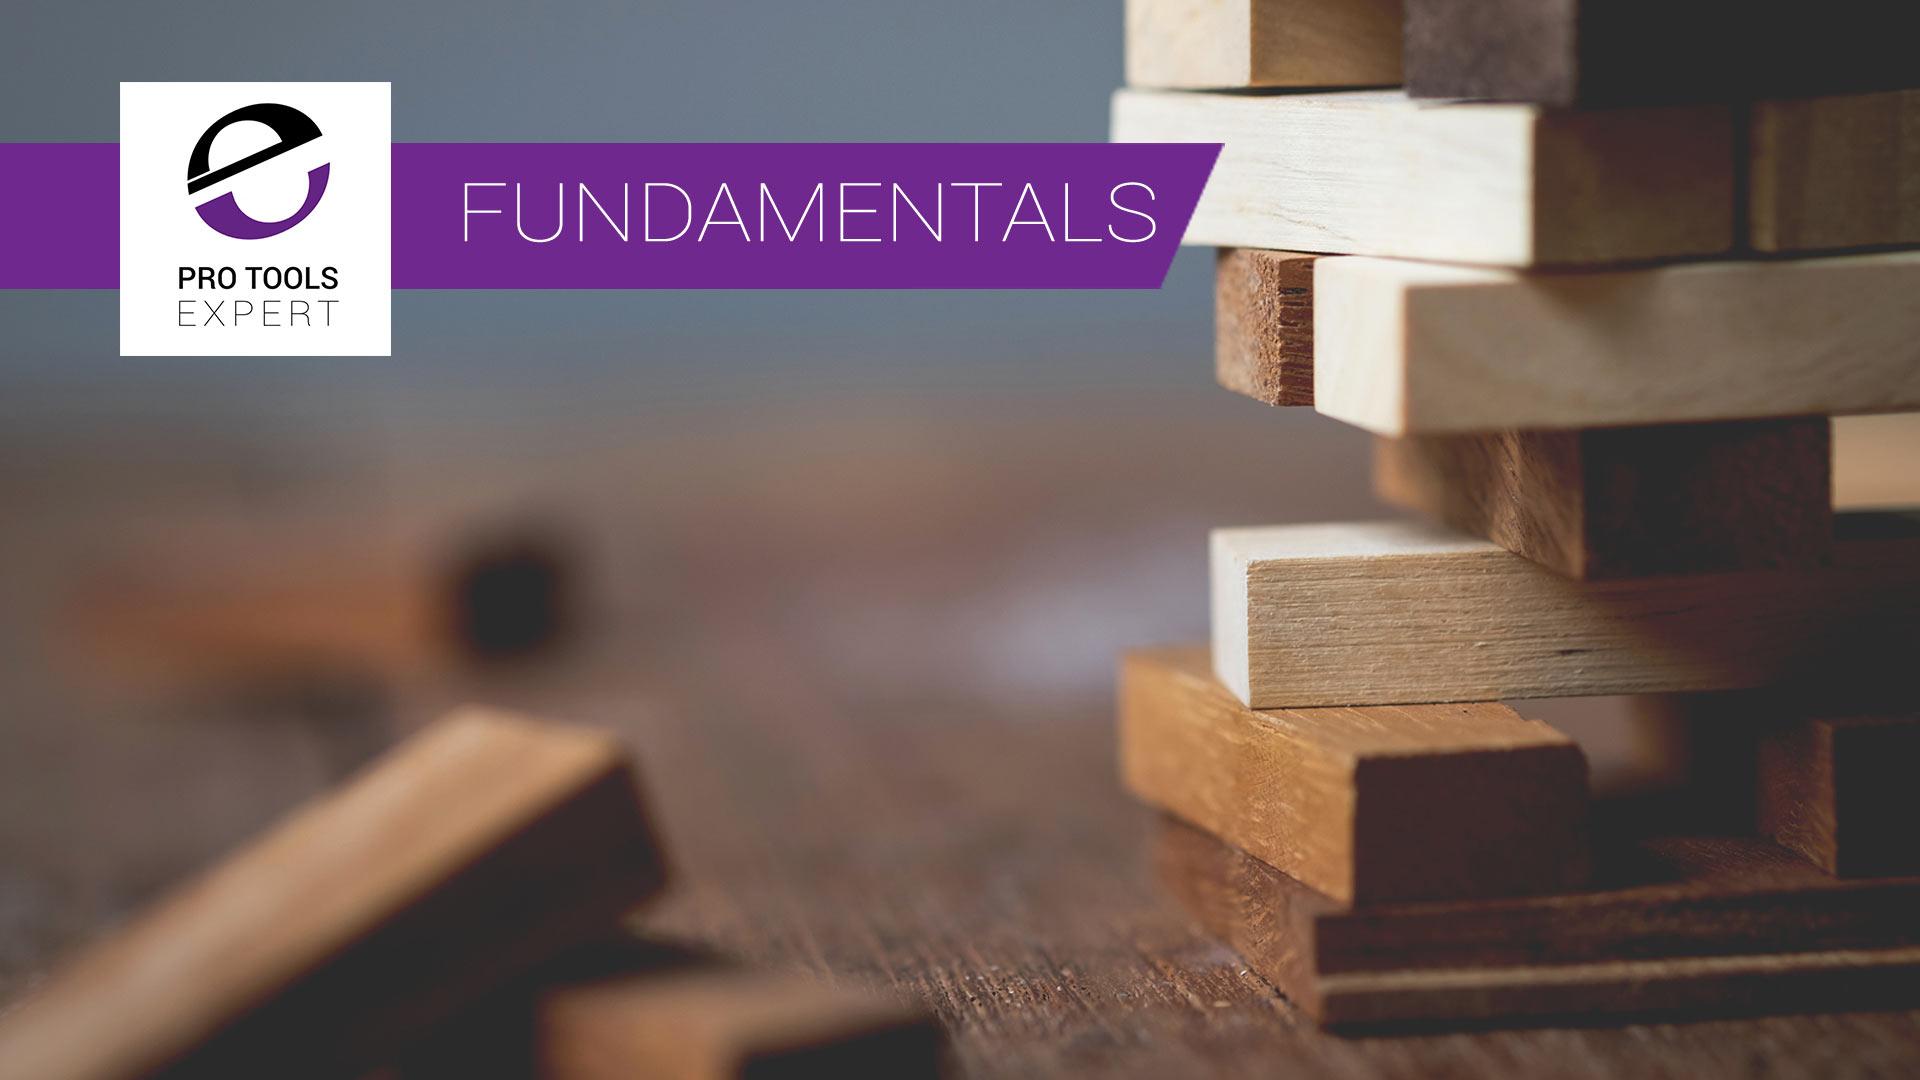 Pro Tools Fundamentals - 5 Uses For Utility Plug Ins